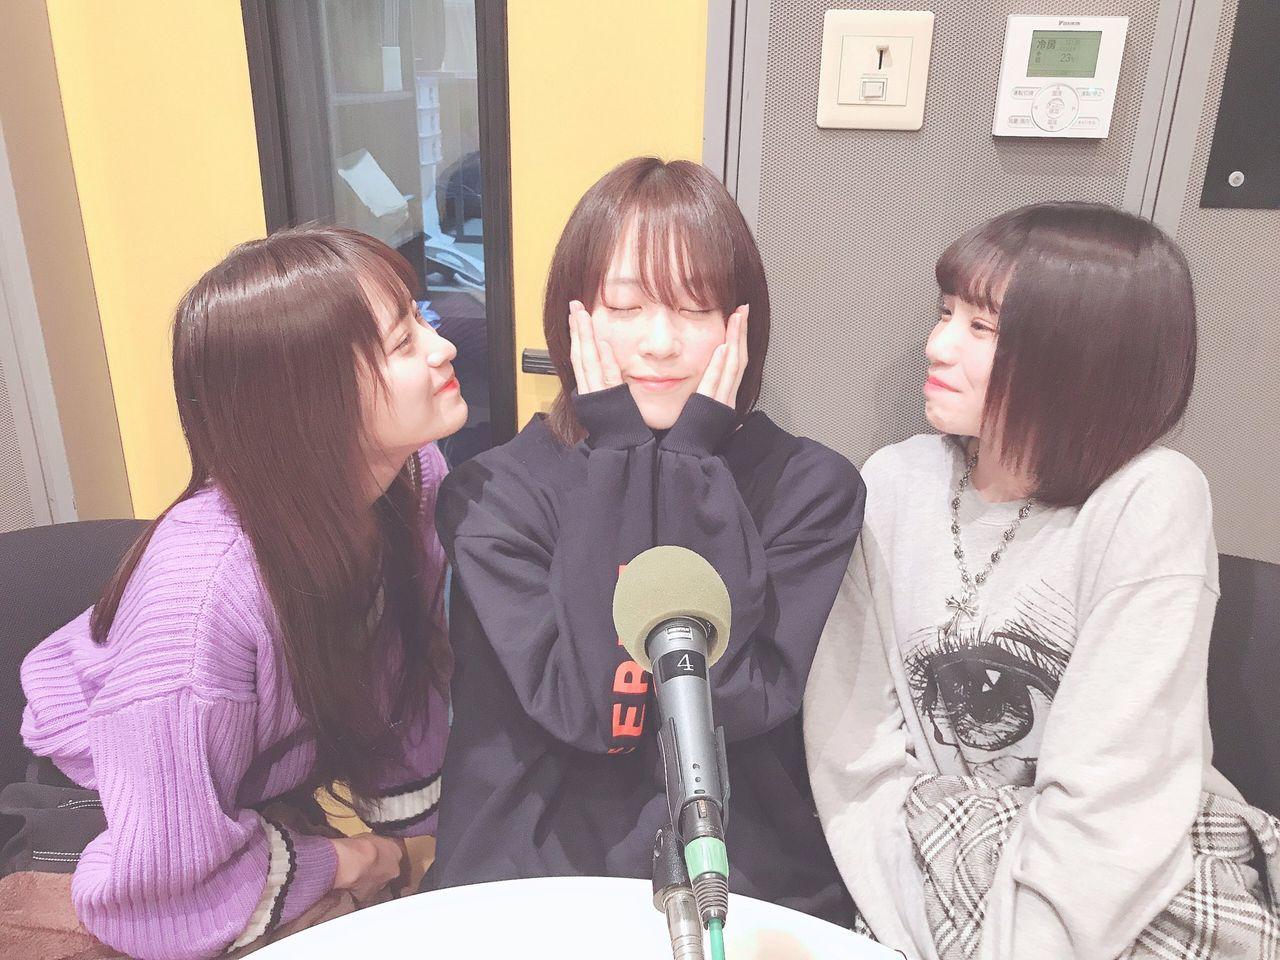 【NMB48のじゃんぐるレディOh!】ぶちあげエイリアン✕三田麻央=神回【清水里香・水田詩織】